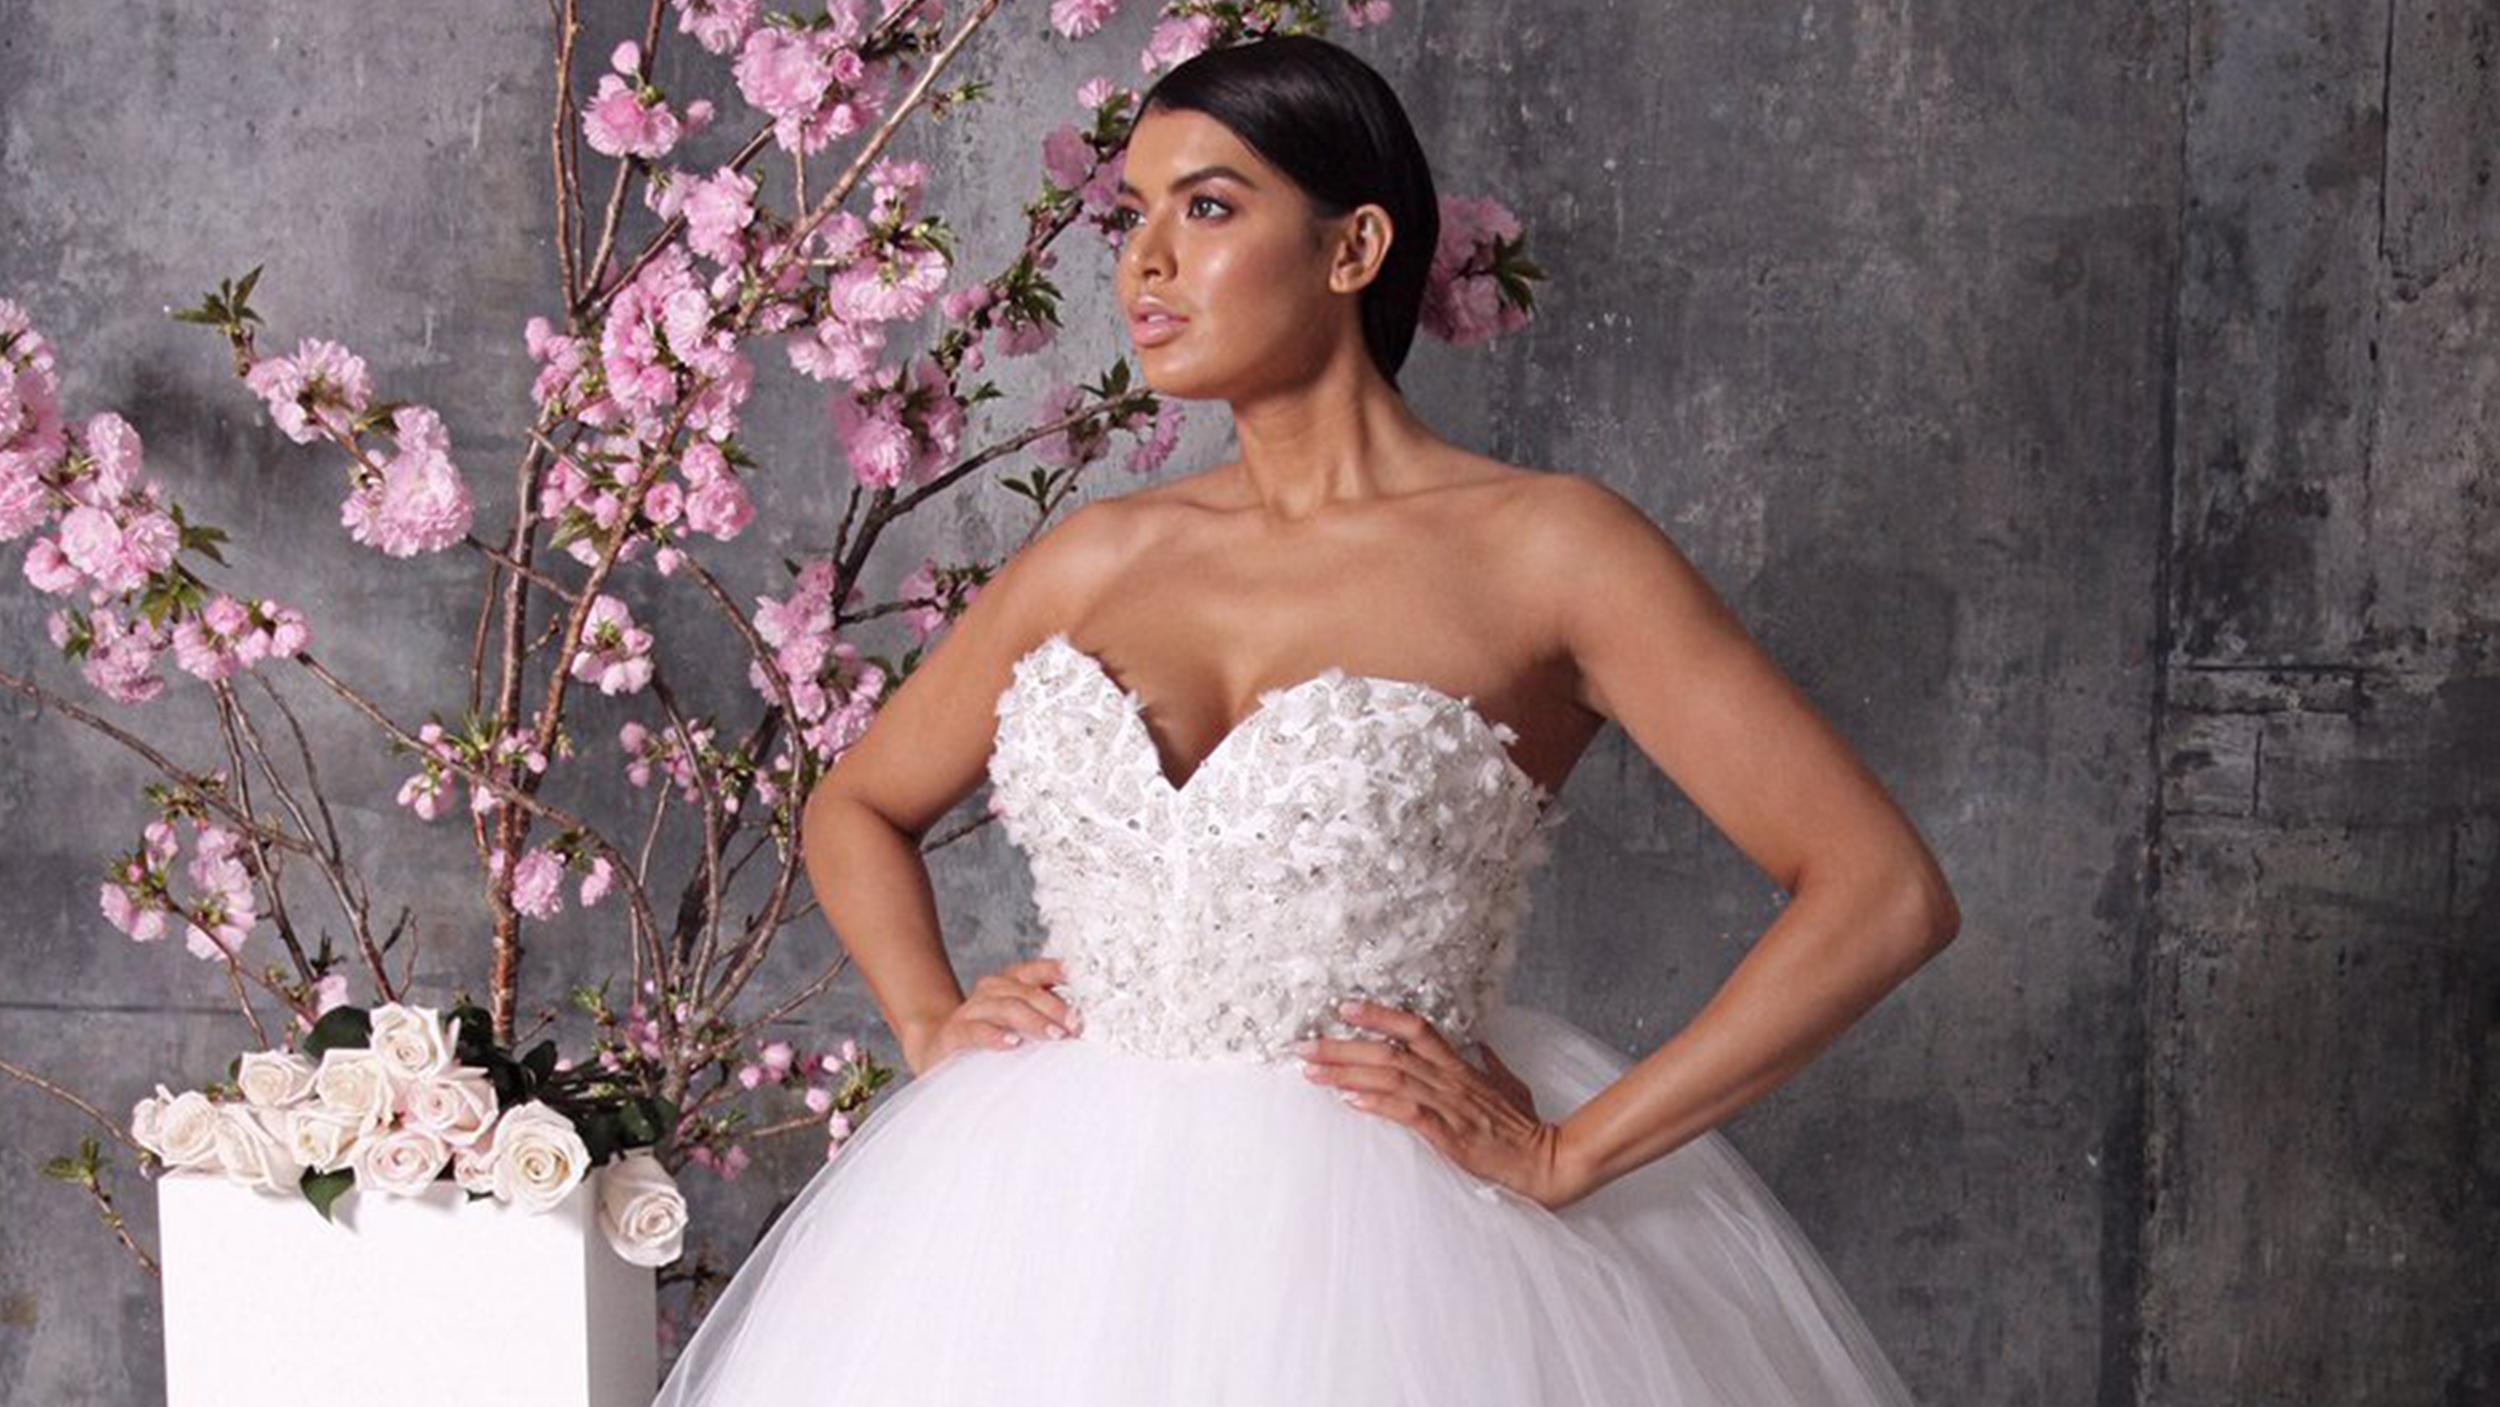 Christian siriano s bridal collection embraces plus sizes for Christian siriano plus size wedding dress